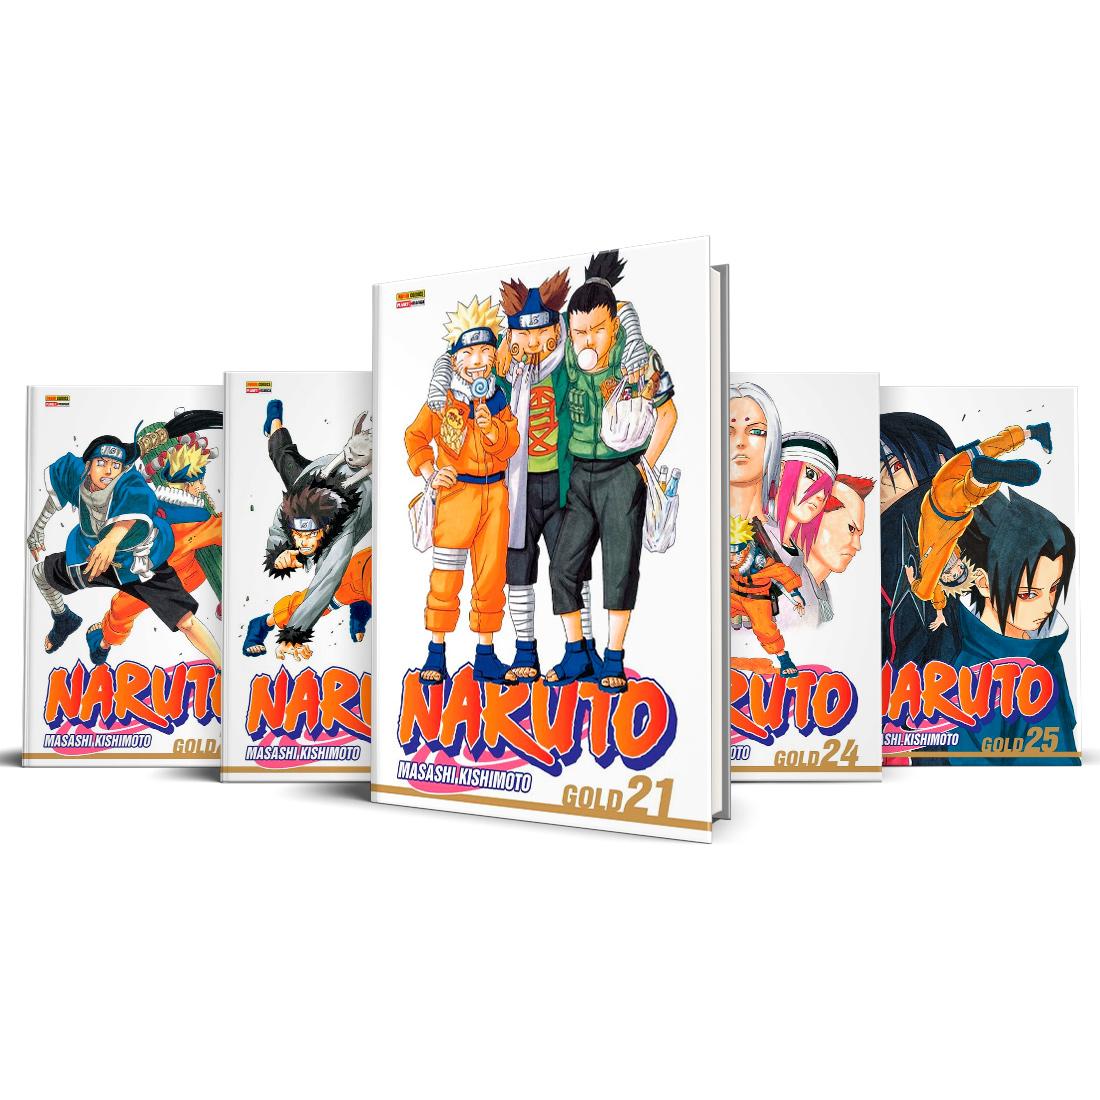 Box Naruto Gold Vols. 21 ao 25